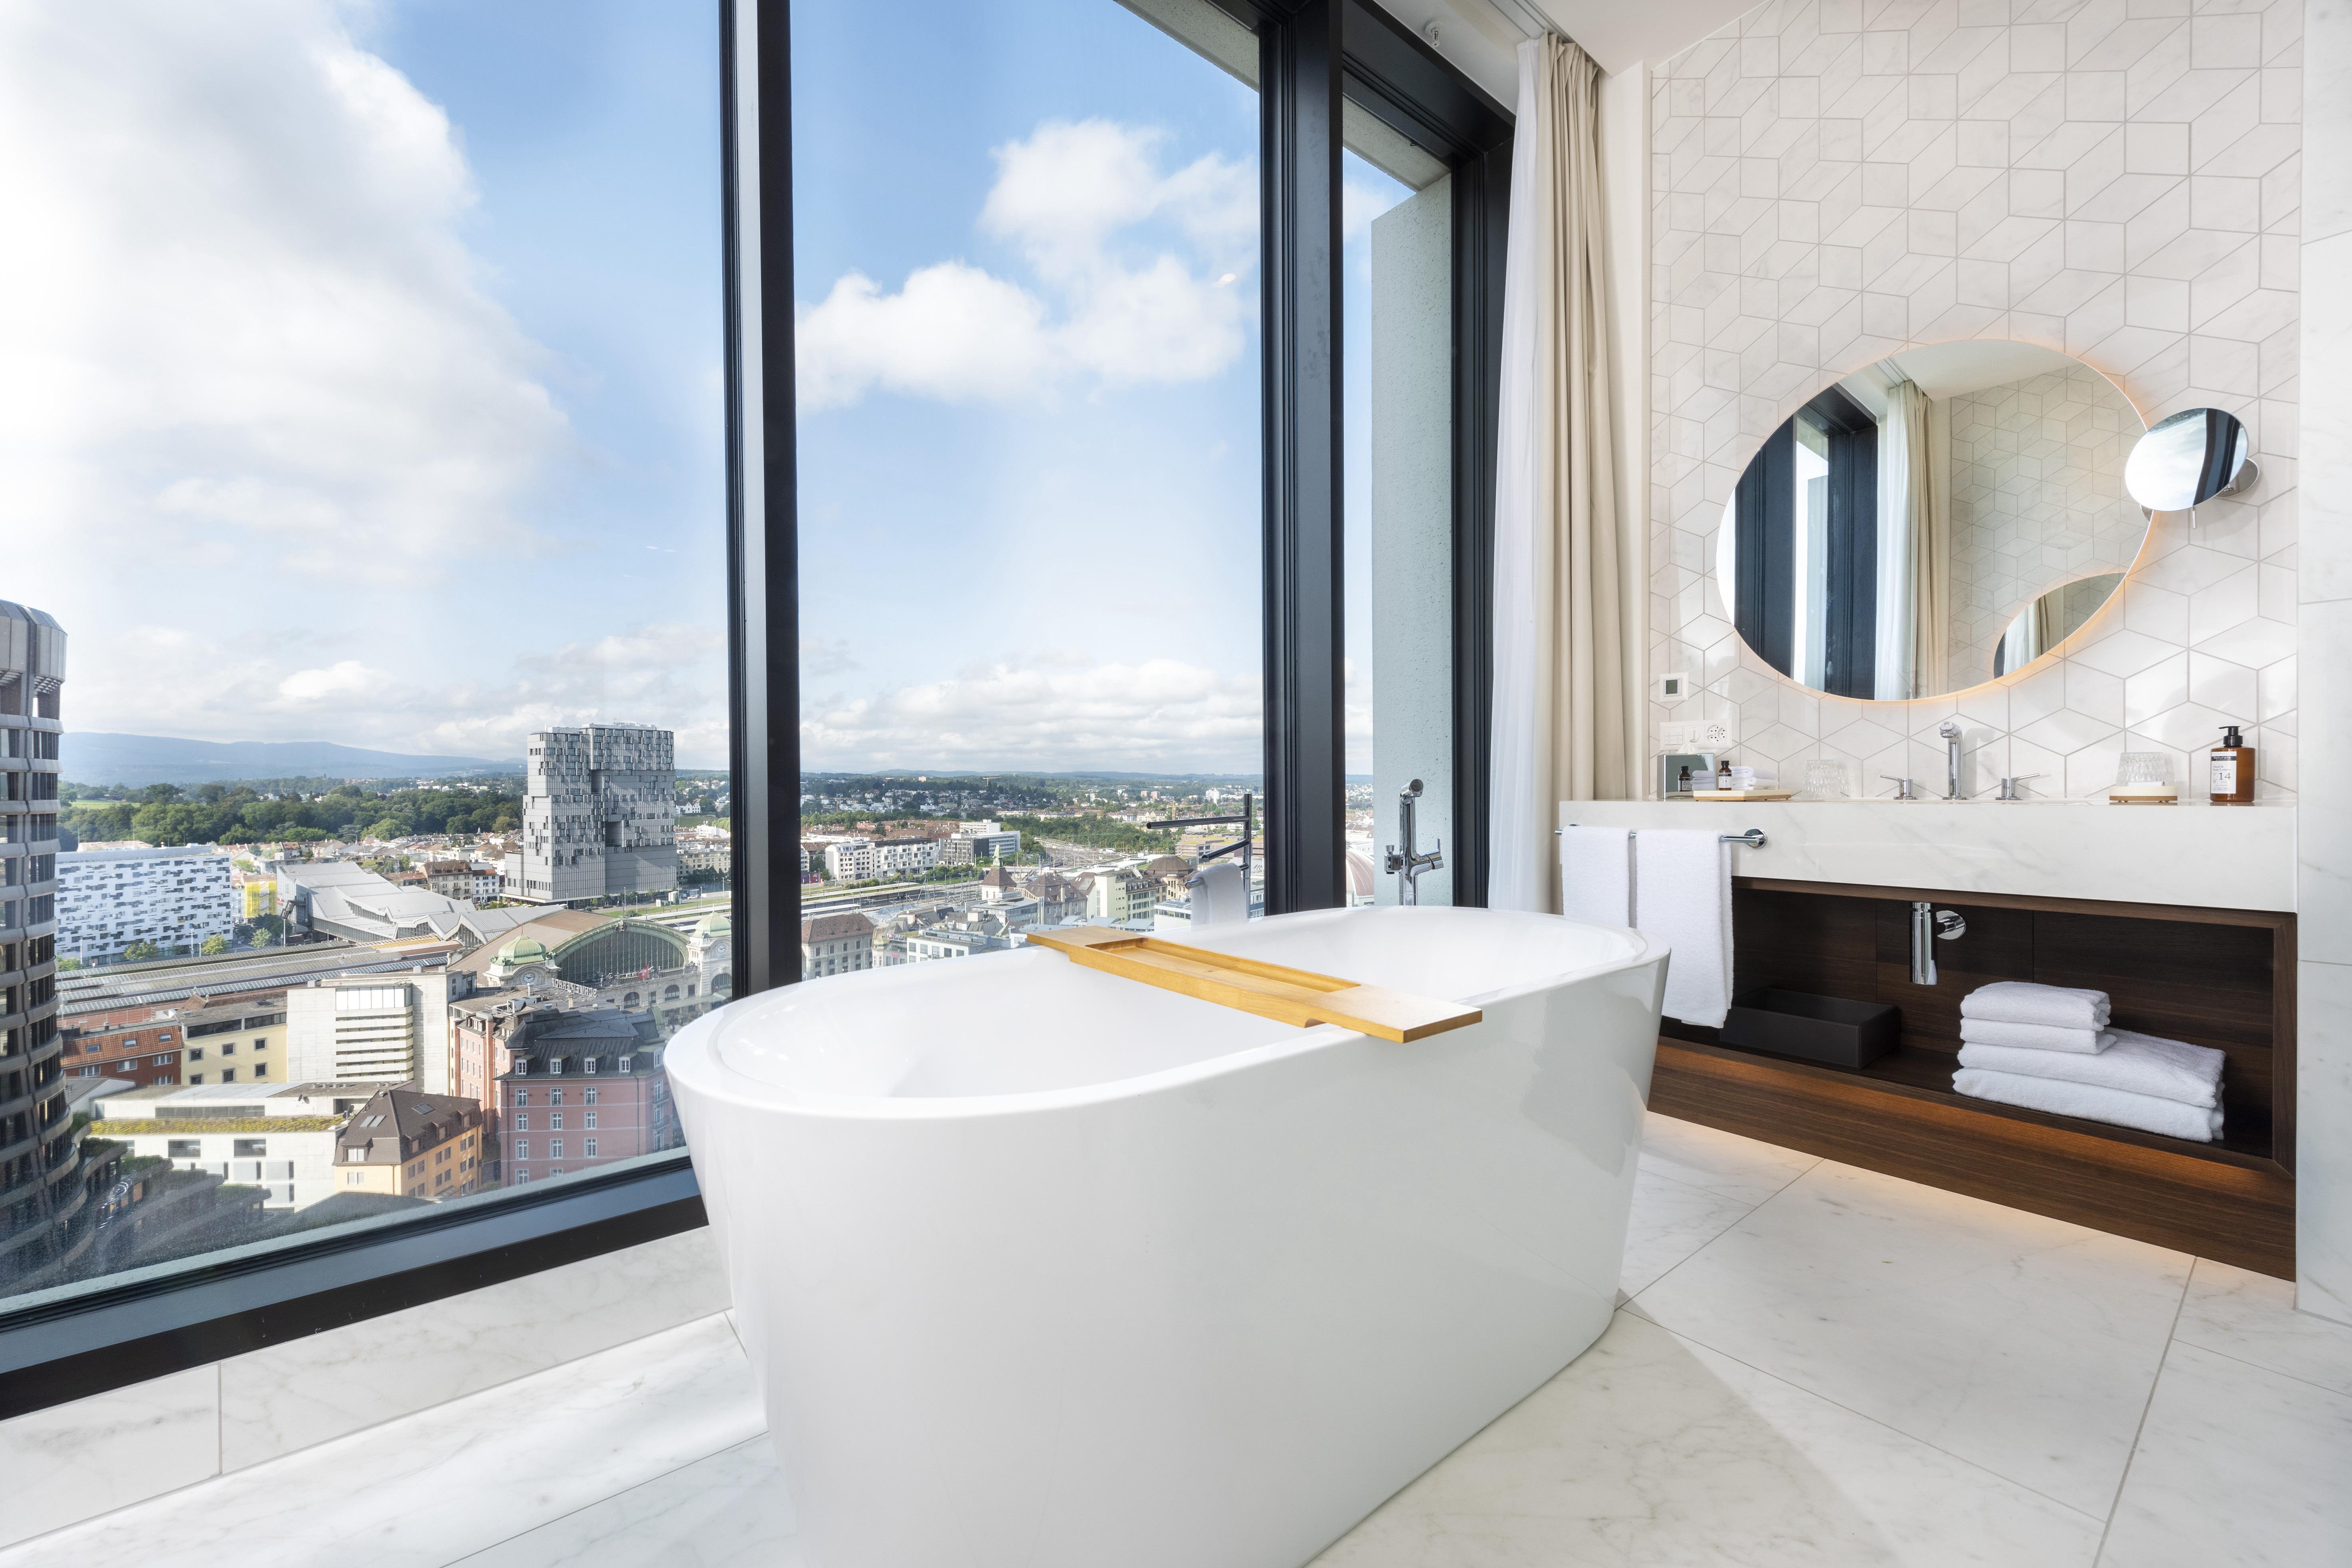 Junior-Suite-Bathroom_0007.JPG#asset:1209